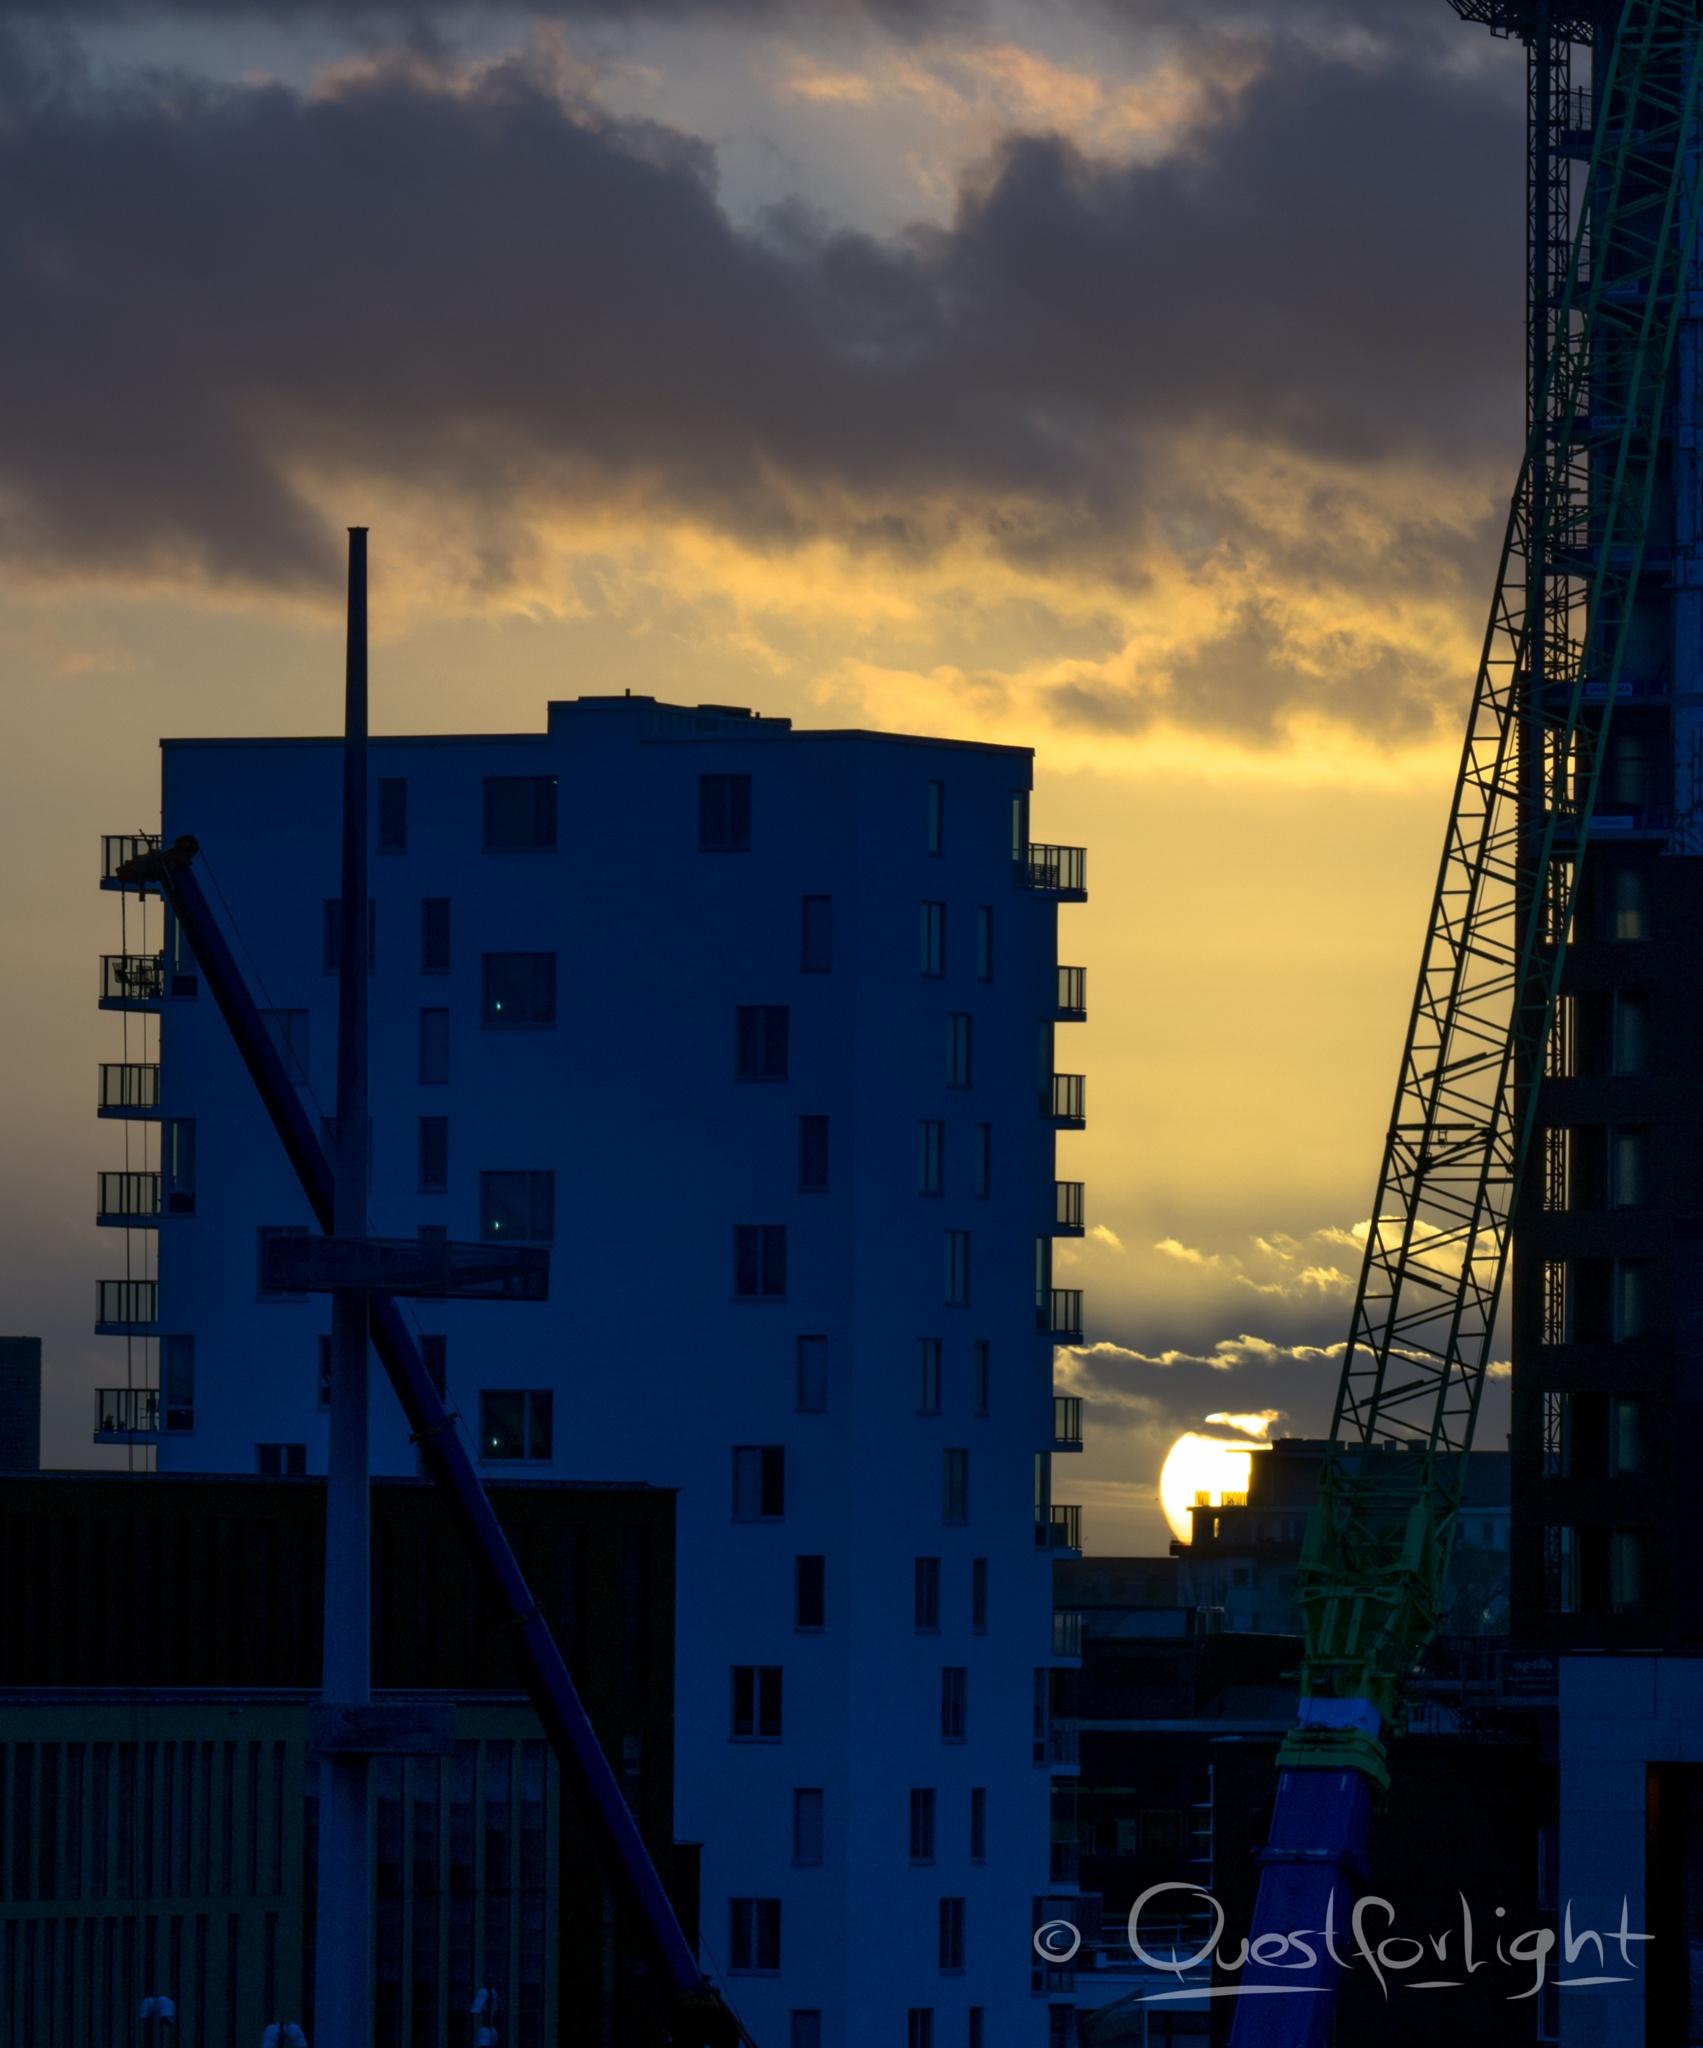 Sunset 2 by QuestForLight&LAS